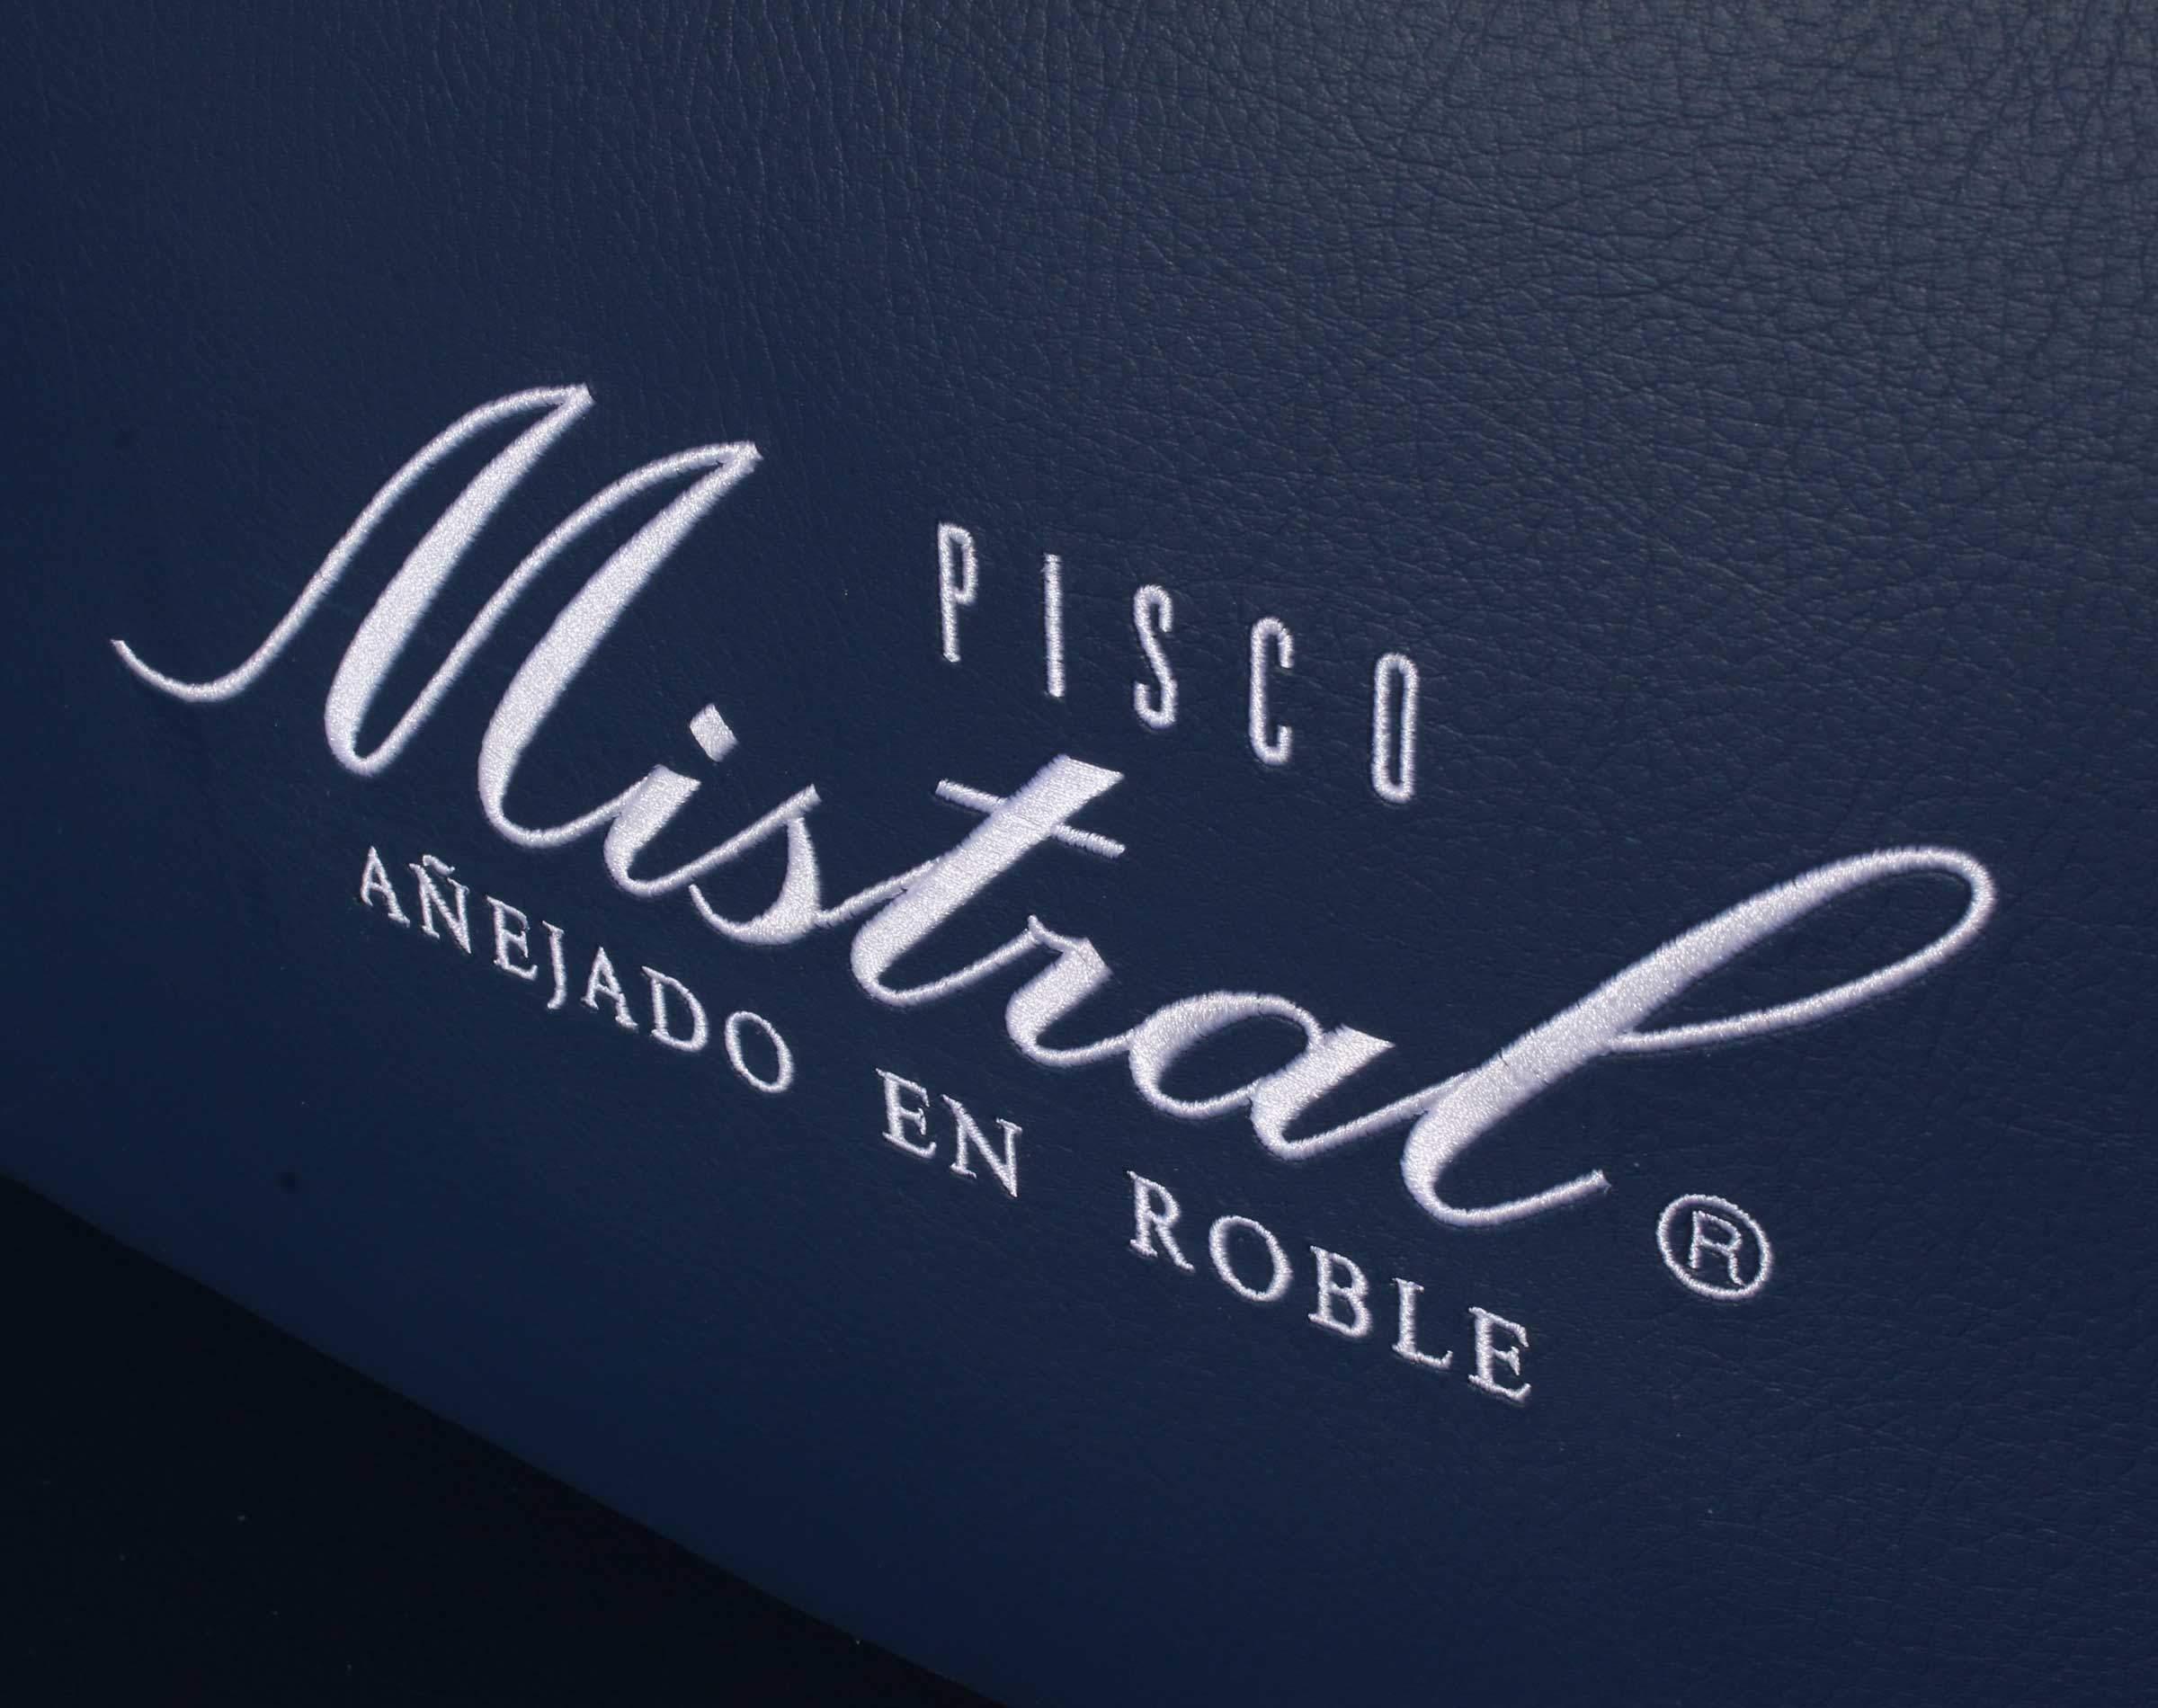 logotipo pisco mistral